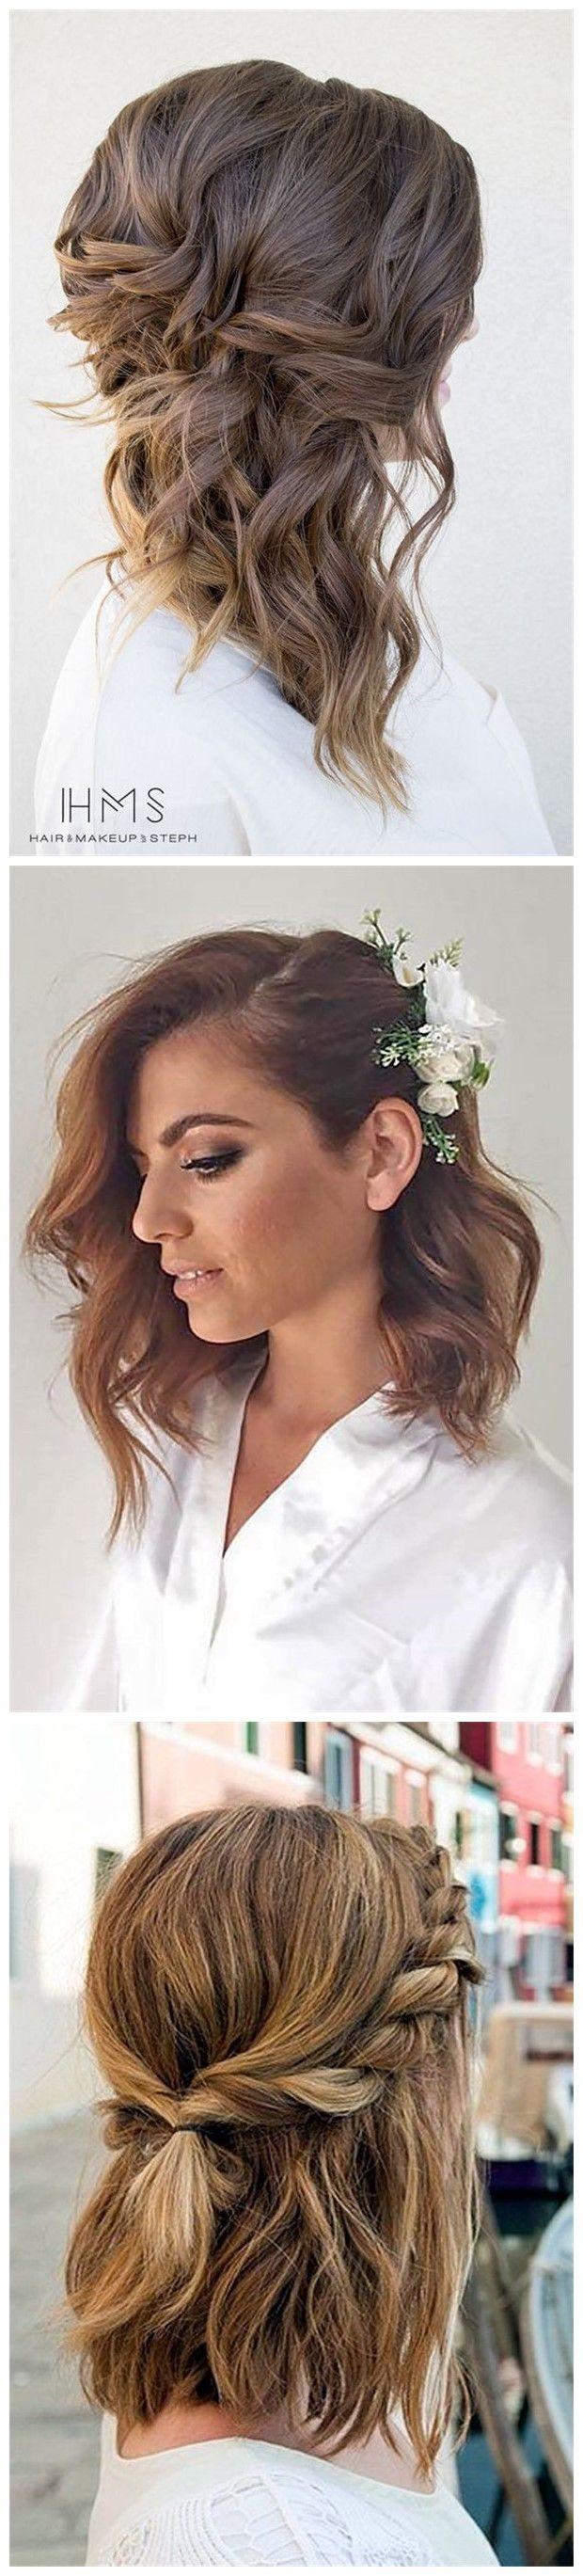 24 Lovely Medium-length Hairstyles For 2018 Weddings